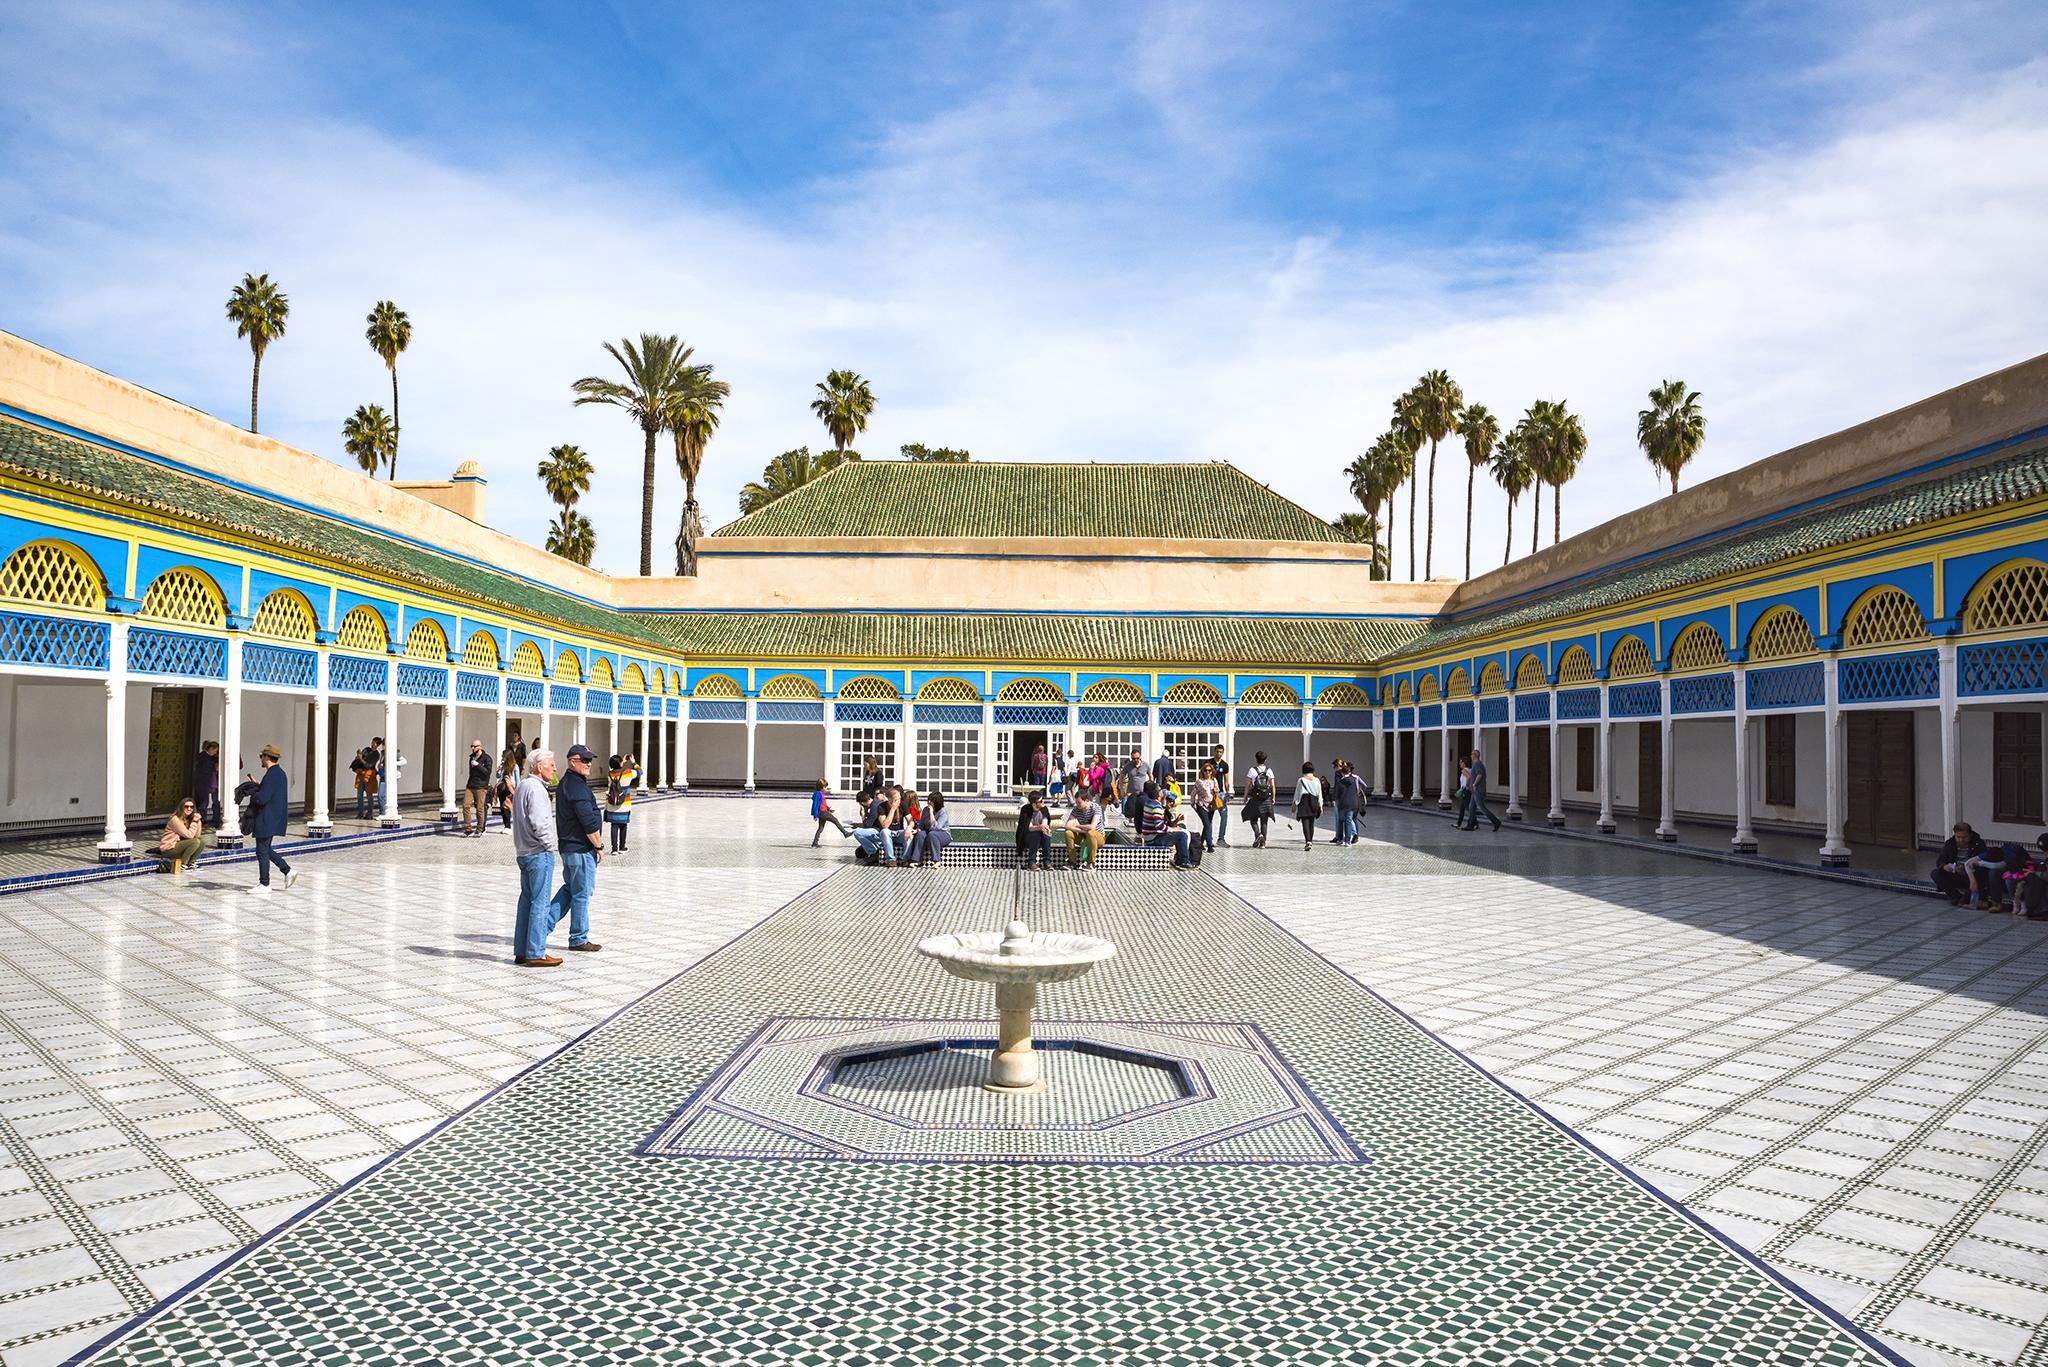 The Bahia Palace, Morocco